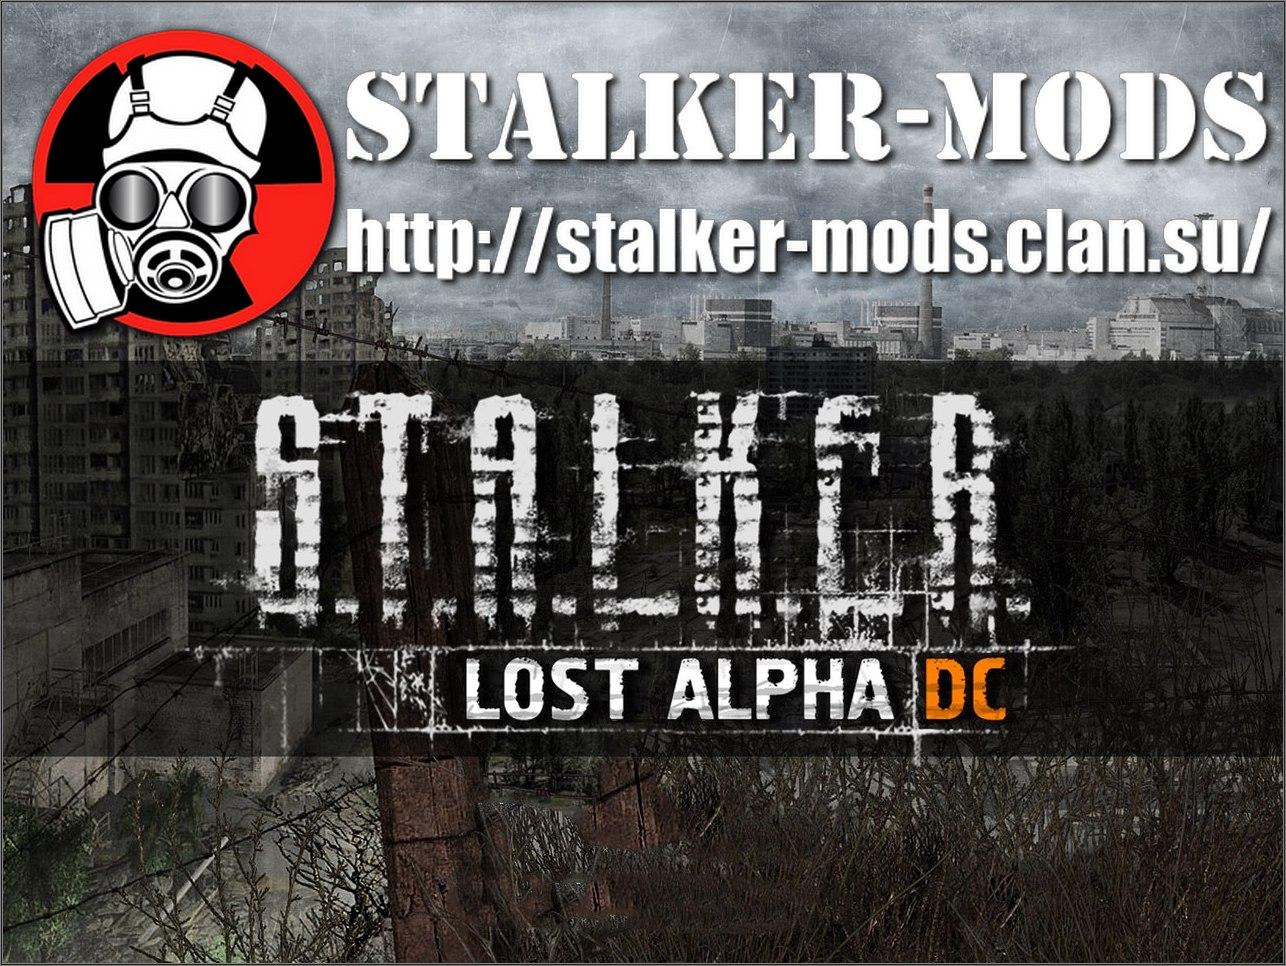 Lost Alpha DC